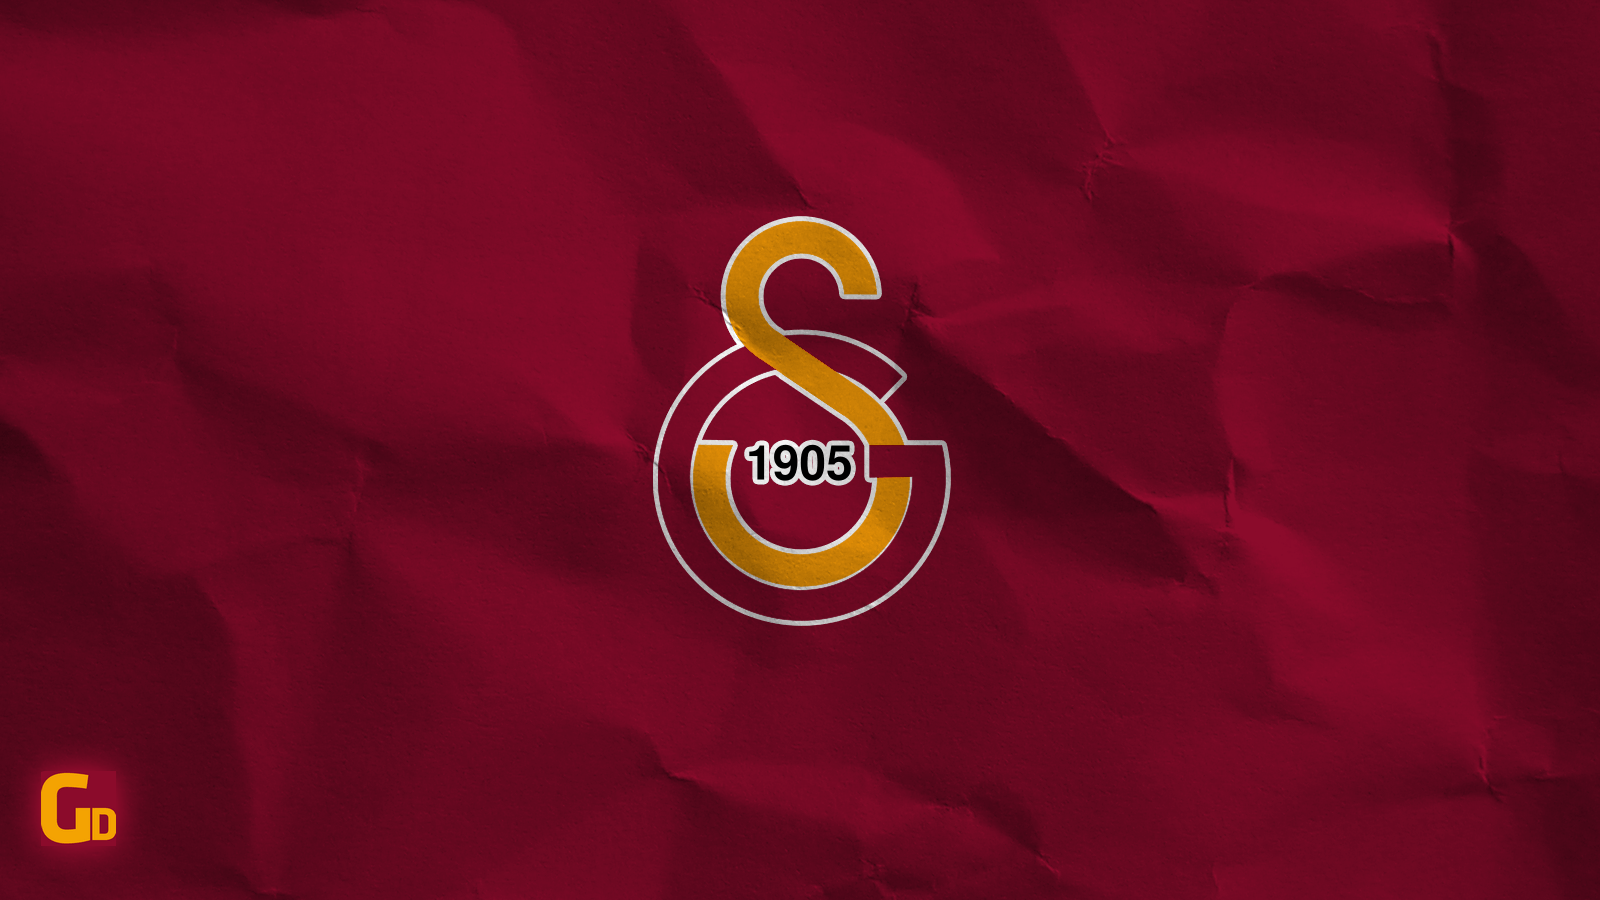 Galatasaray Wallpaper